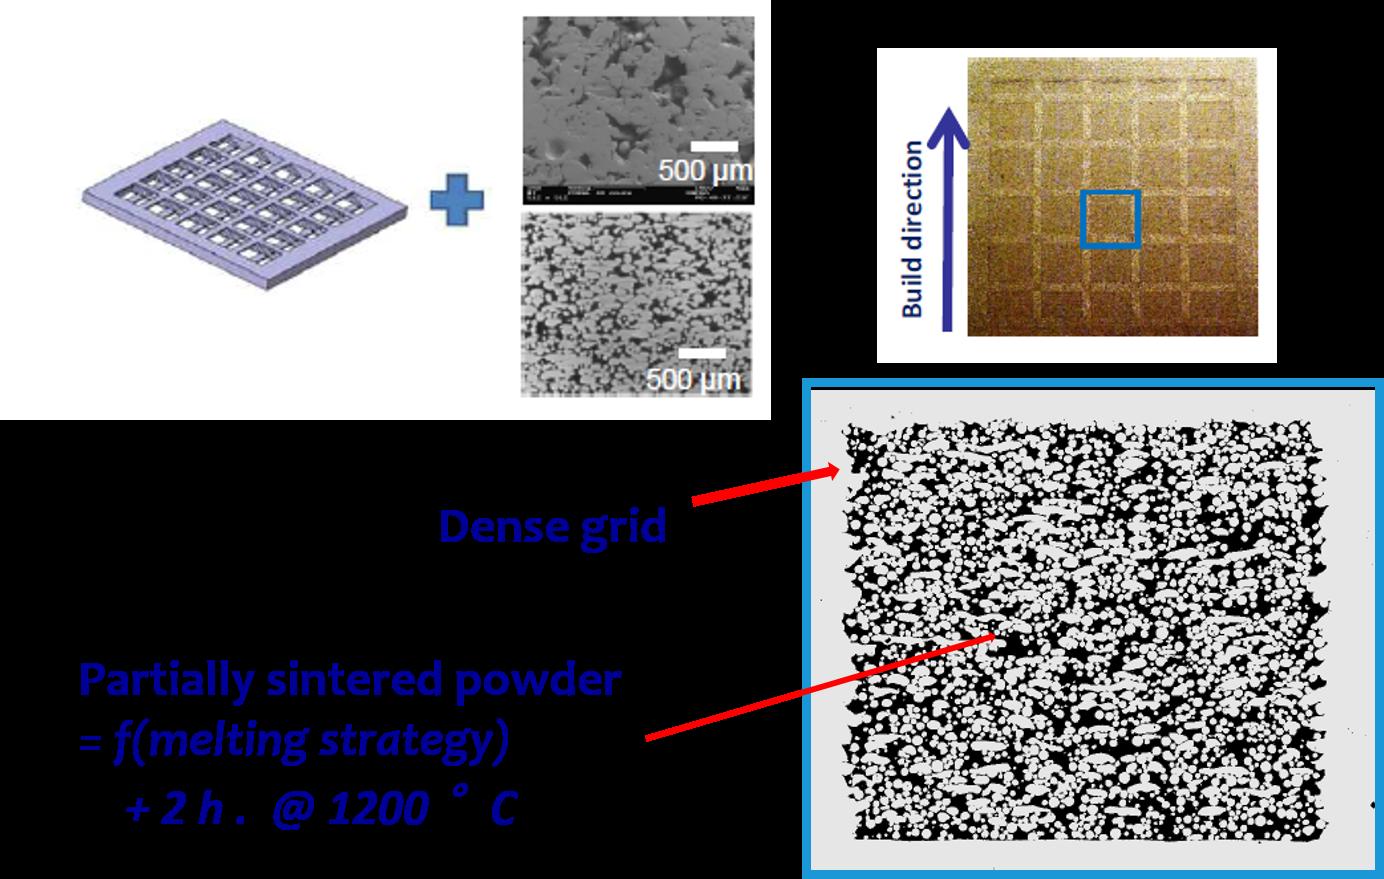 porous grid